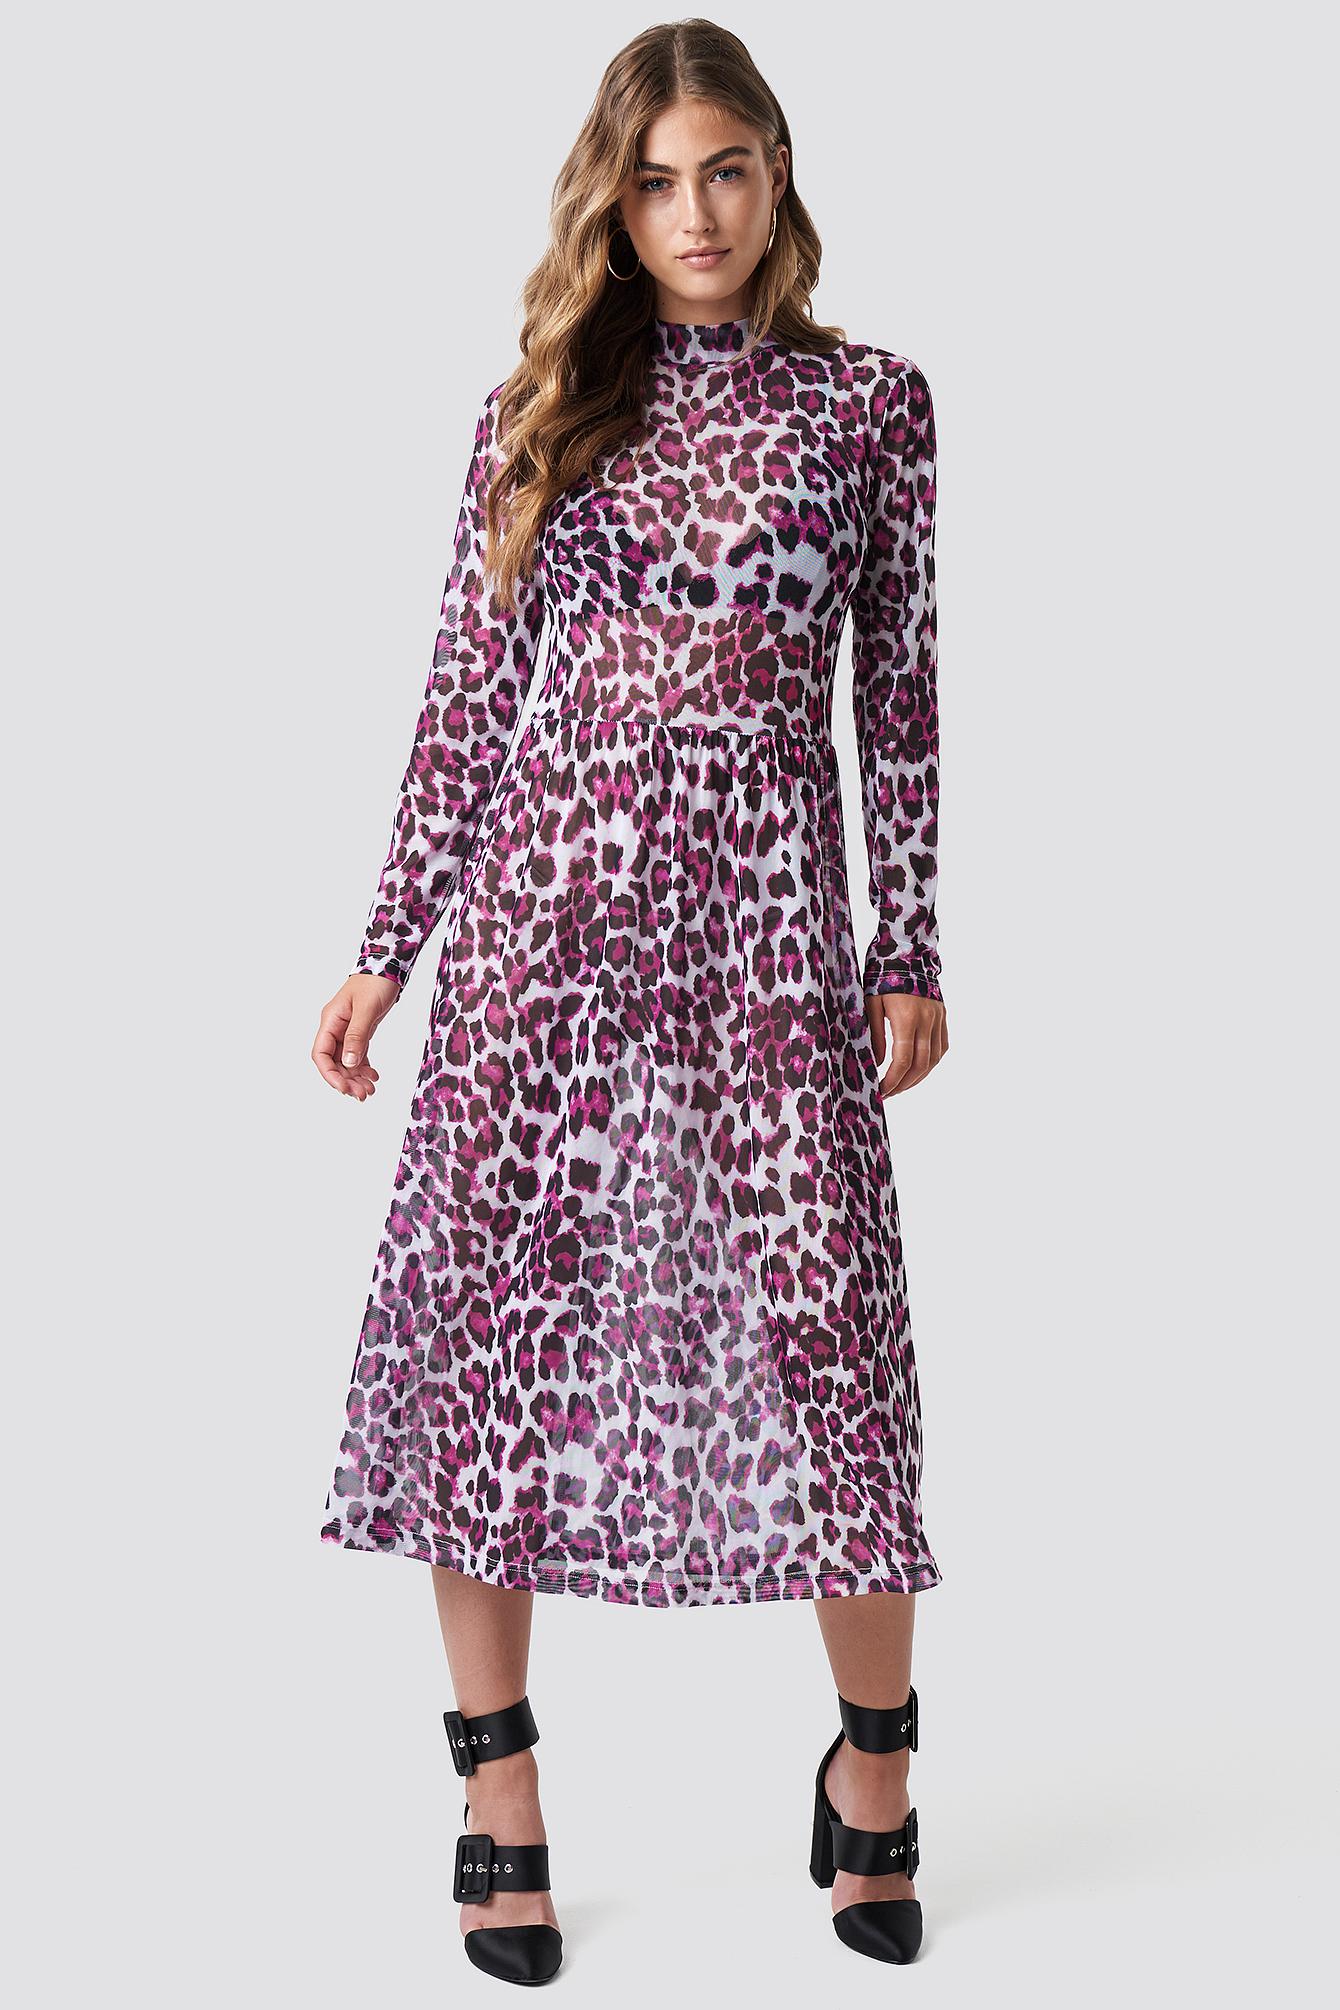 RUT & CIRCLE LEO MESH DRESS - PINK